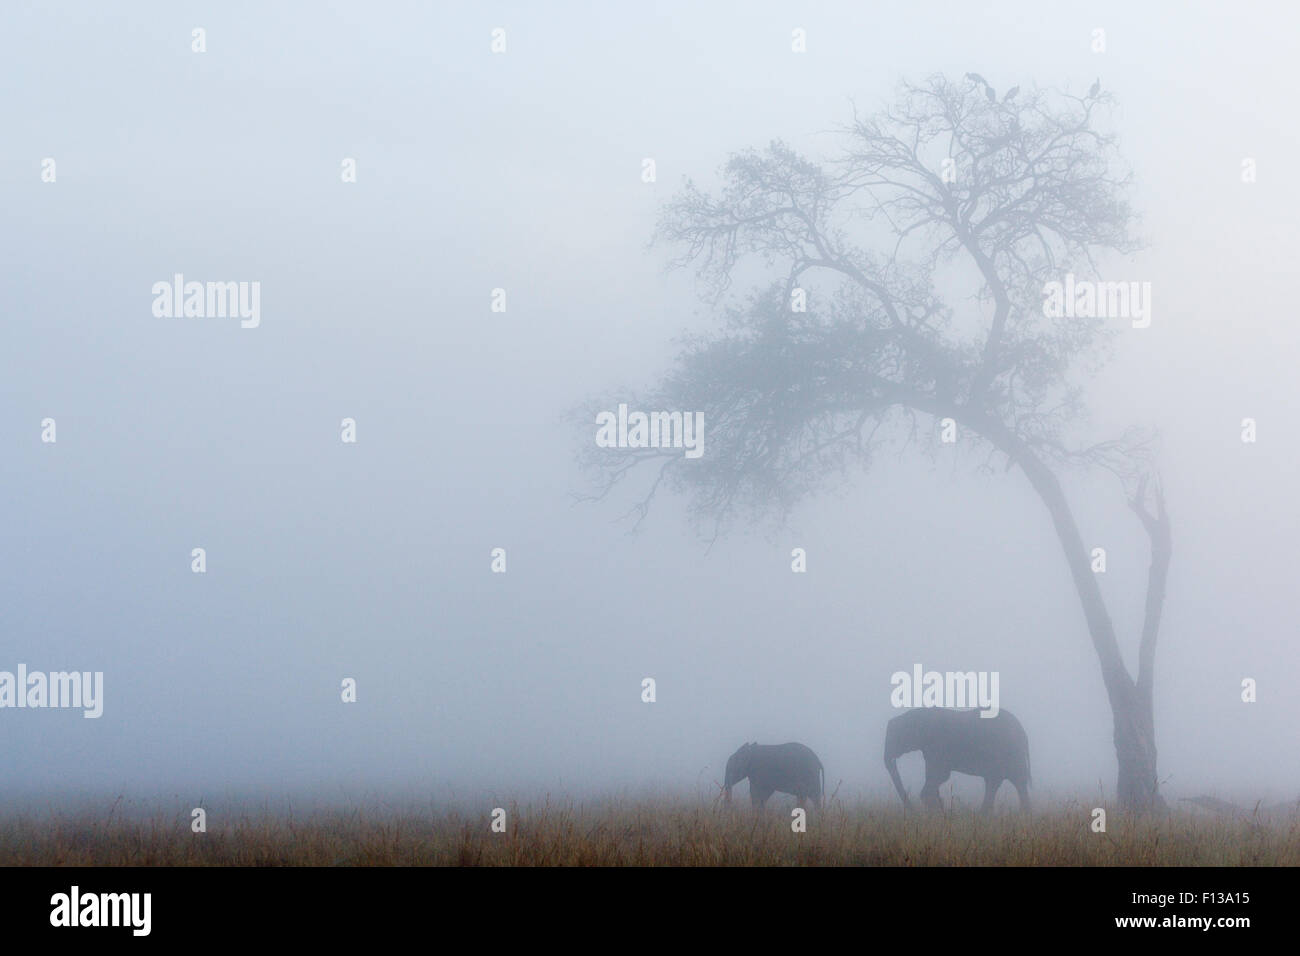 Elephant (Loxodonta africana) female and calf under tree in the rain, Masai-Mara game reserve, Kenya. - Stock Image